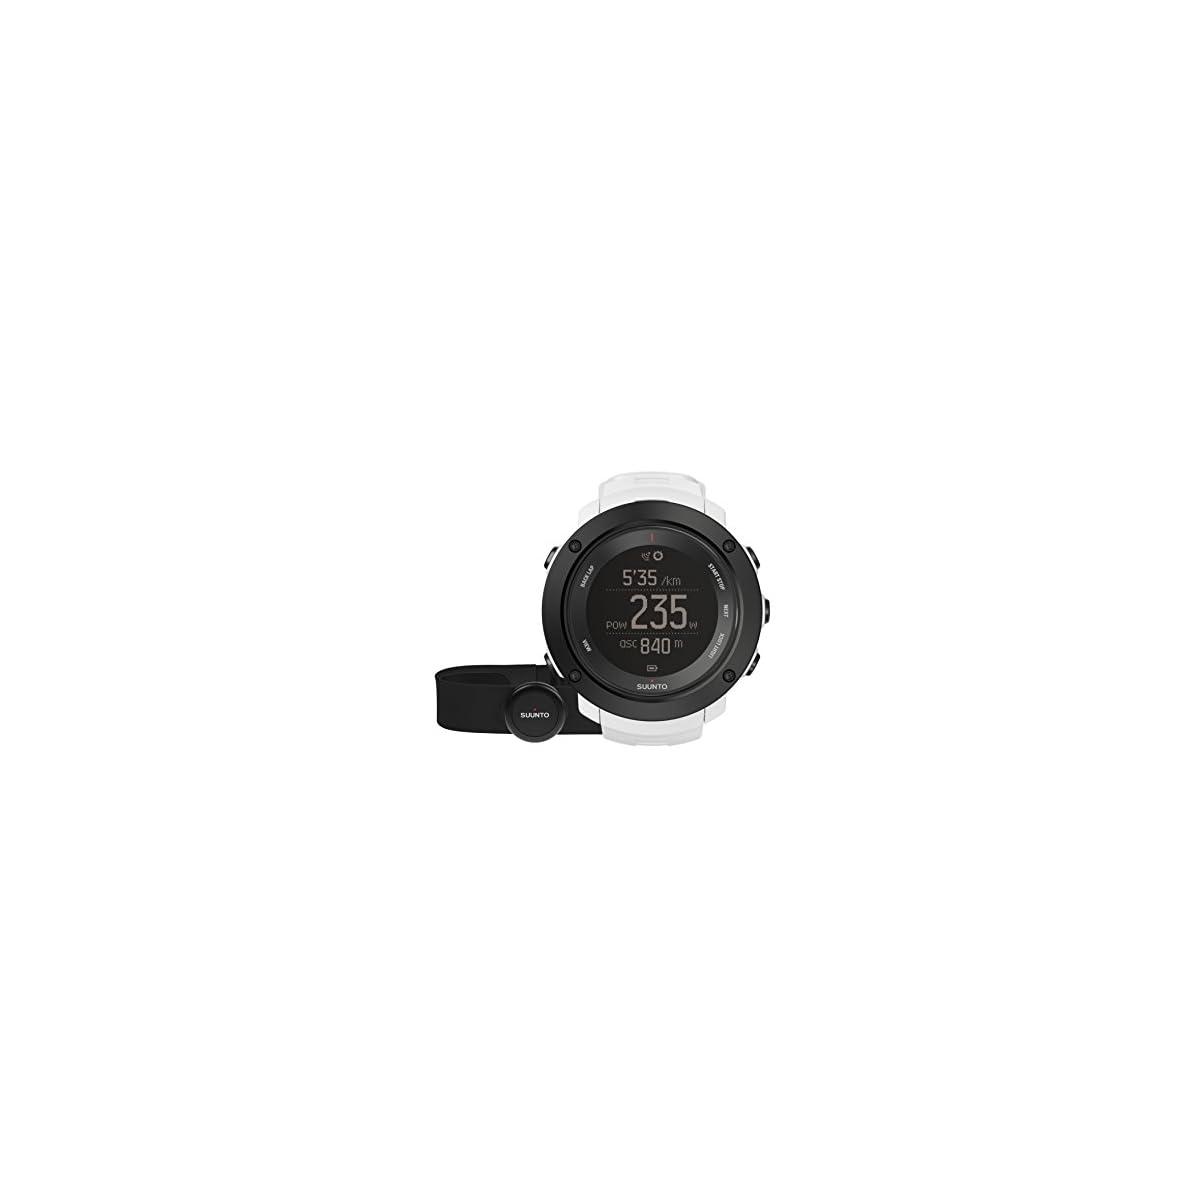 41FFKMnsnIL. SS1200  - Suunto - Ambit3 Vertical HR - SS021966000 - Reloj GPS Multideporte + Cinturón de frecuencia cardiaca (Talla M) - Ideal para montaña - Blanco